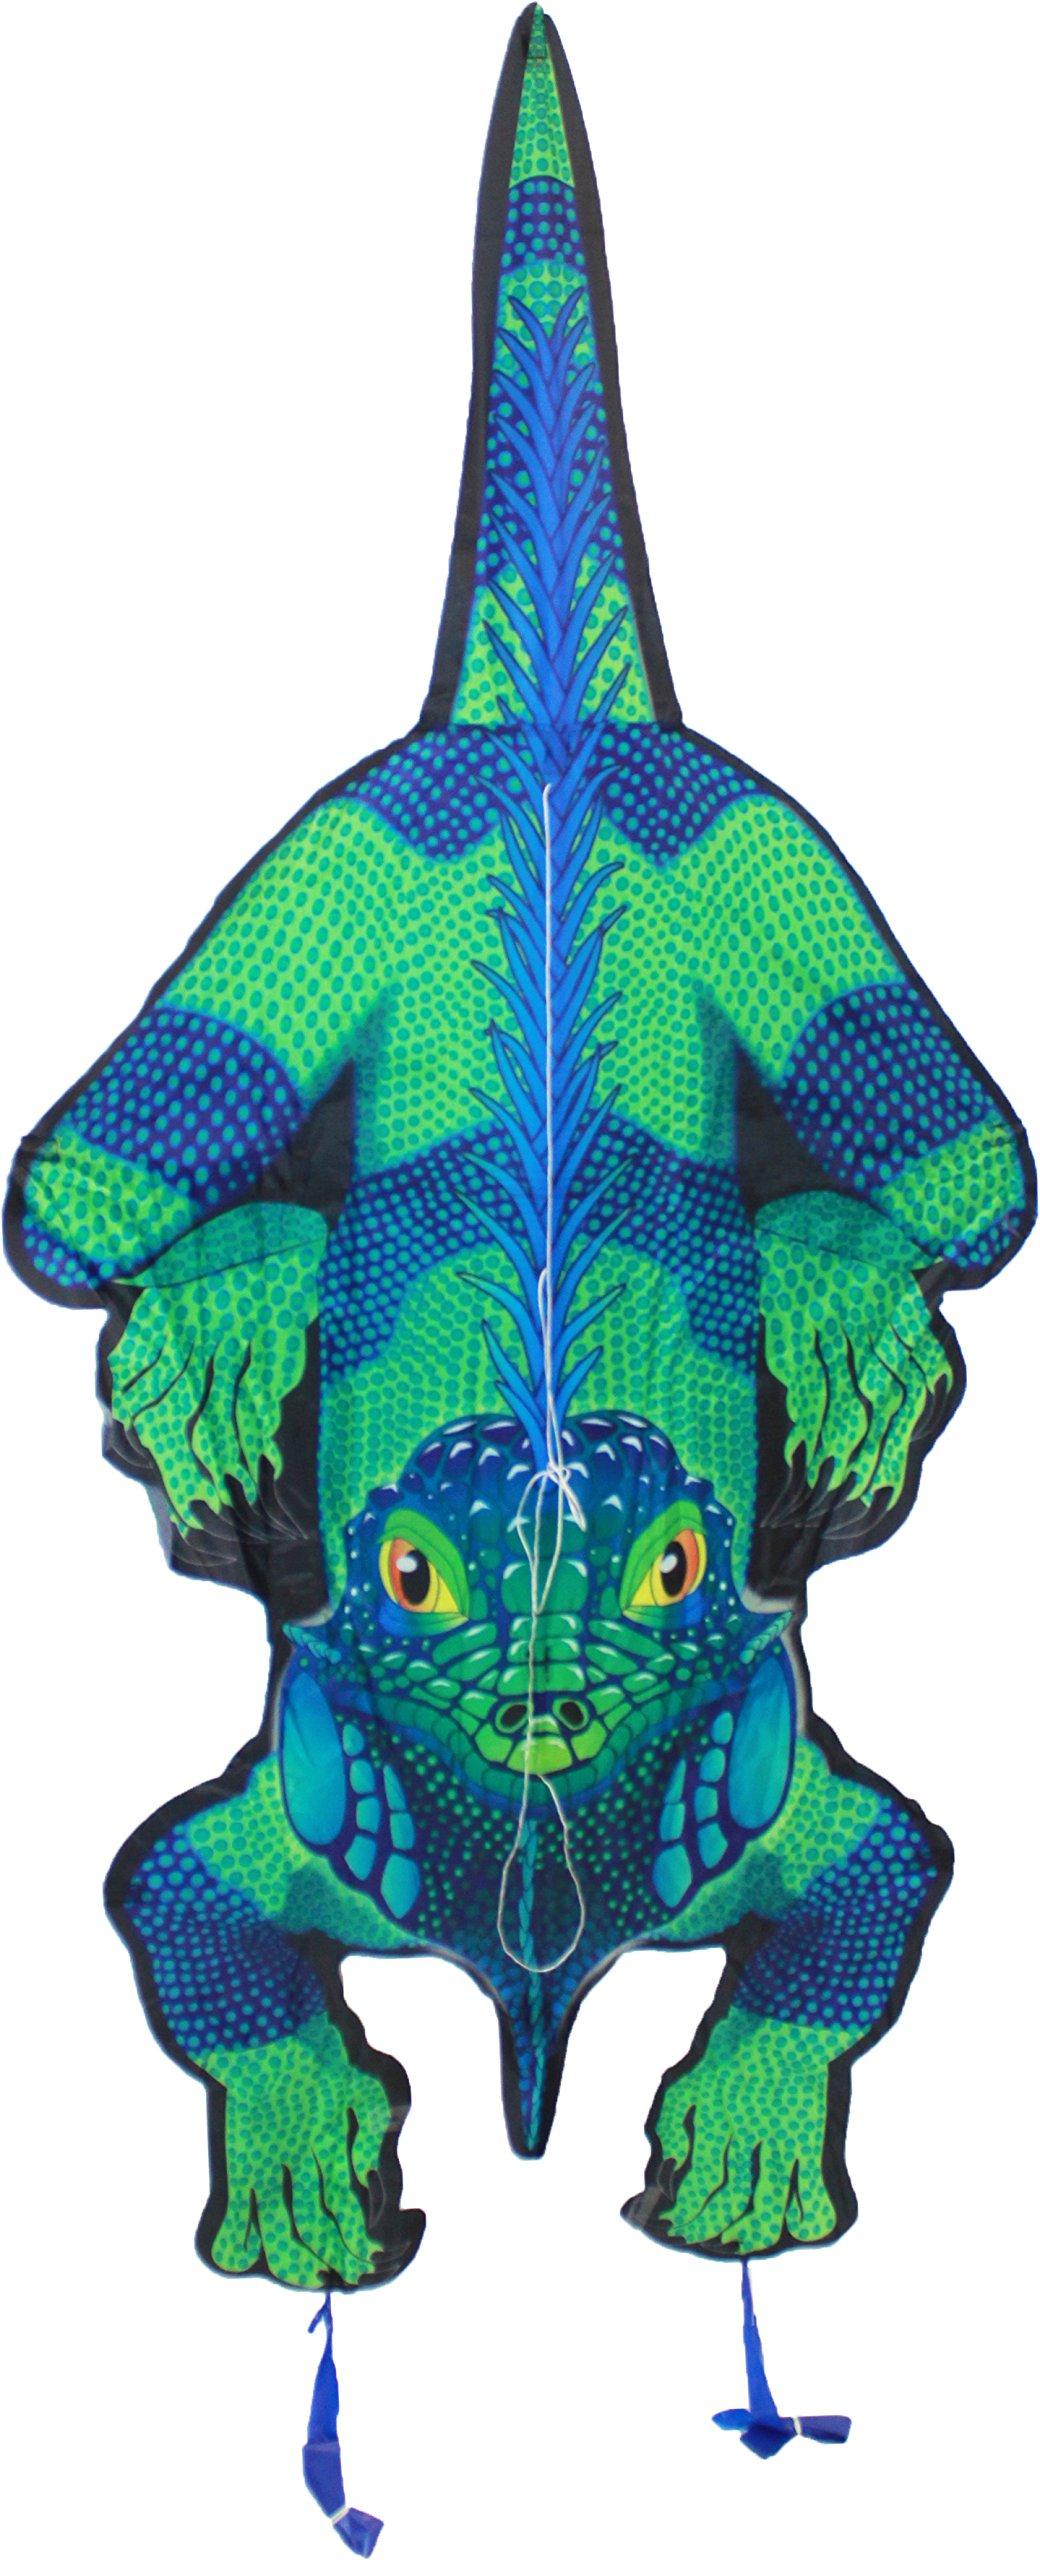 WindNSun RainForest Iguana Rip-Stop Nylon Kite, 59'' Tall